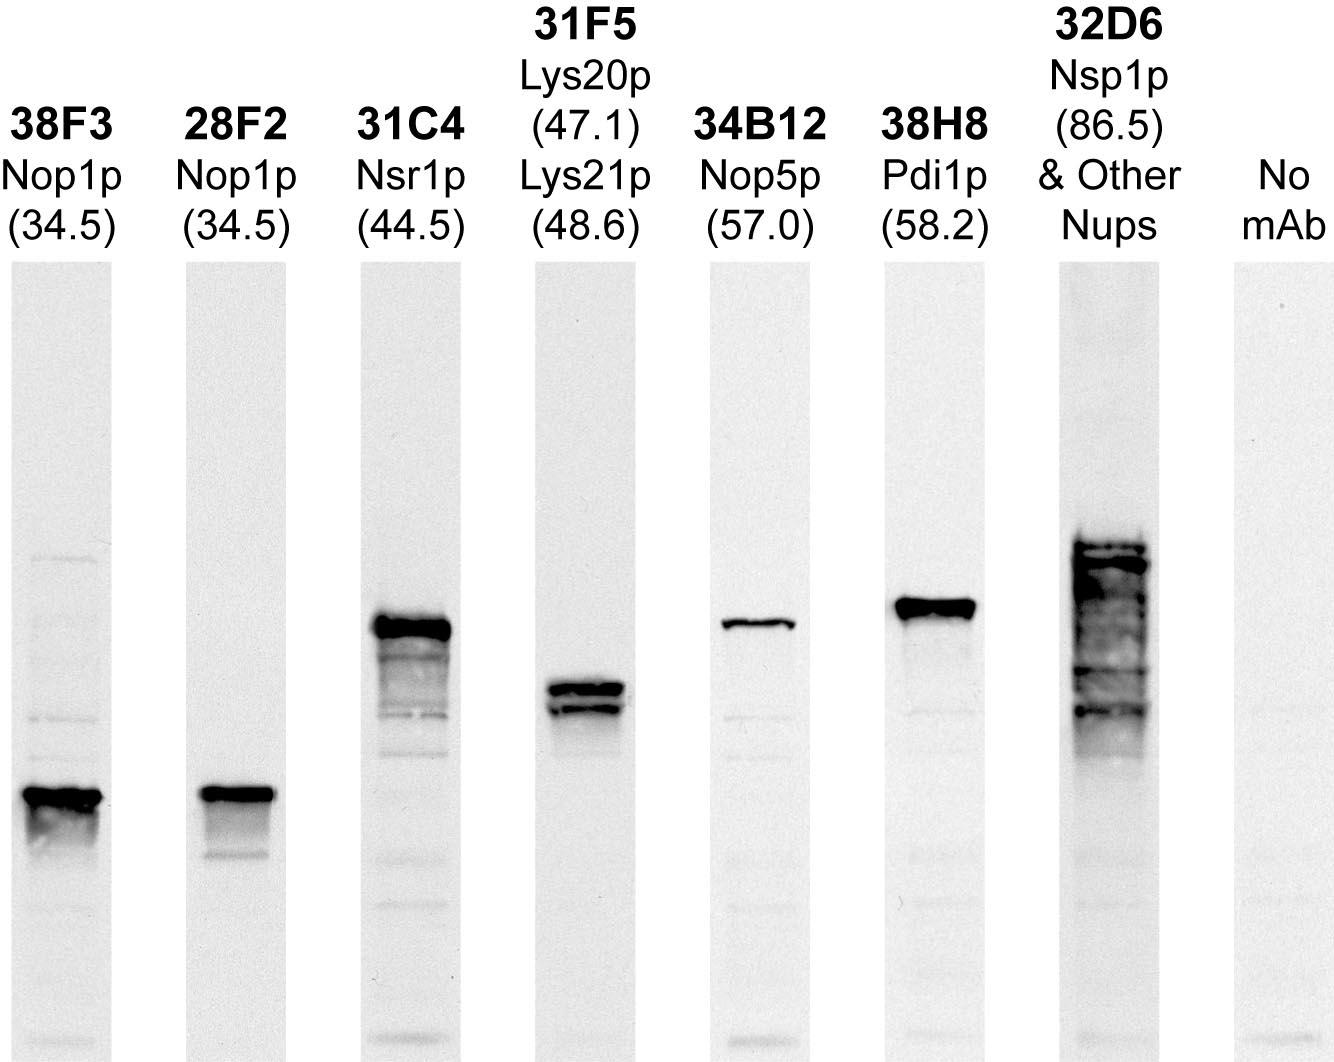 Monoclonal Antibody to Pdi1p  (Clone: 38H8)